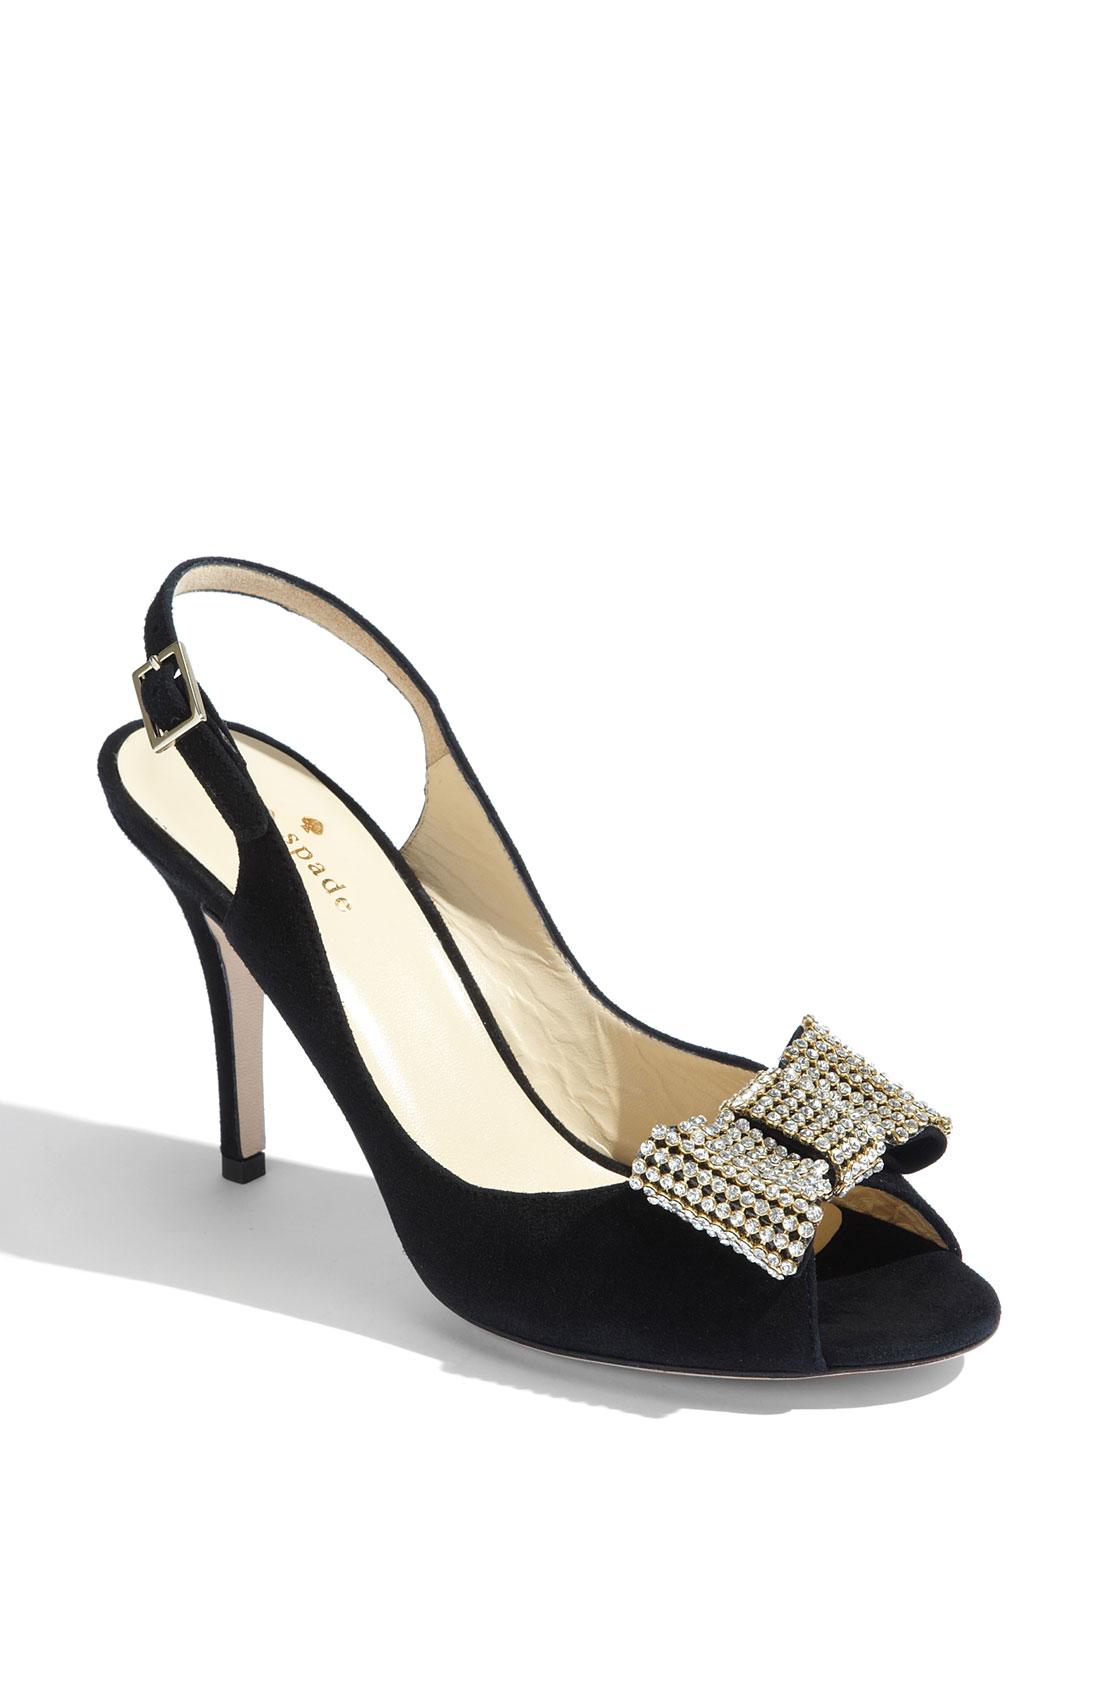 Kate Spade Crown Black Suede Slingback Embellished Pump